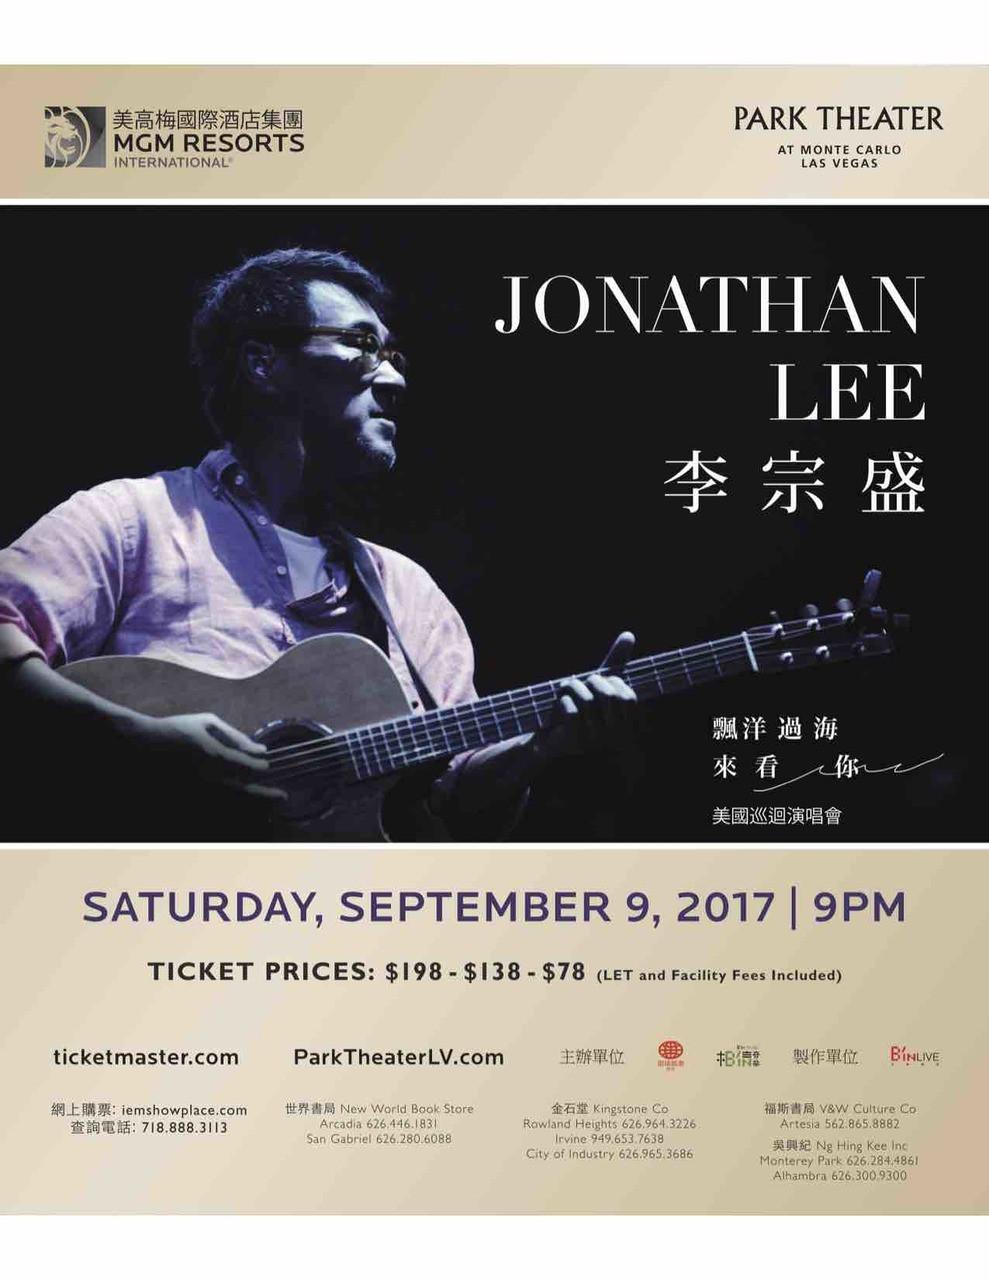 Jonathan Lee Las Vegas 2017